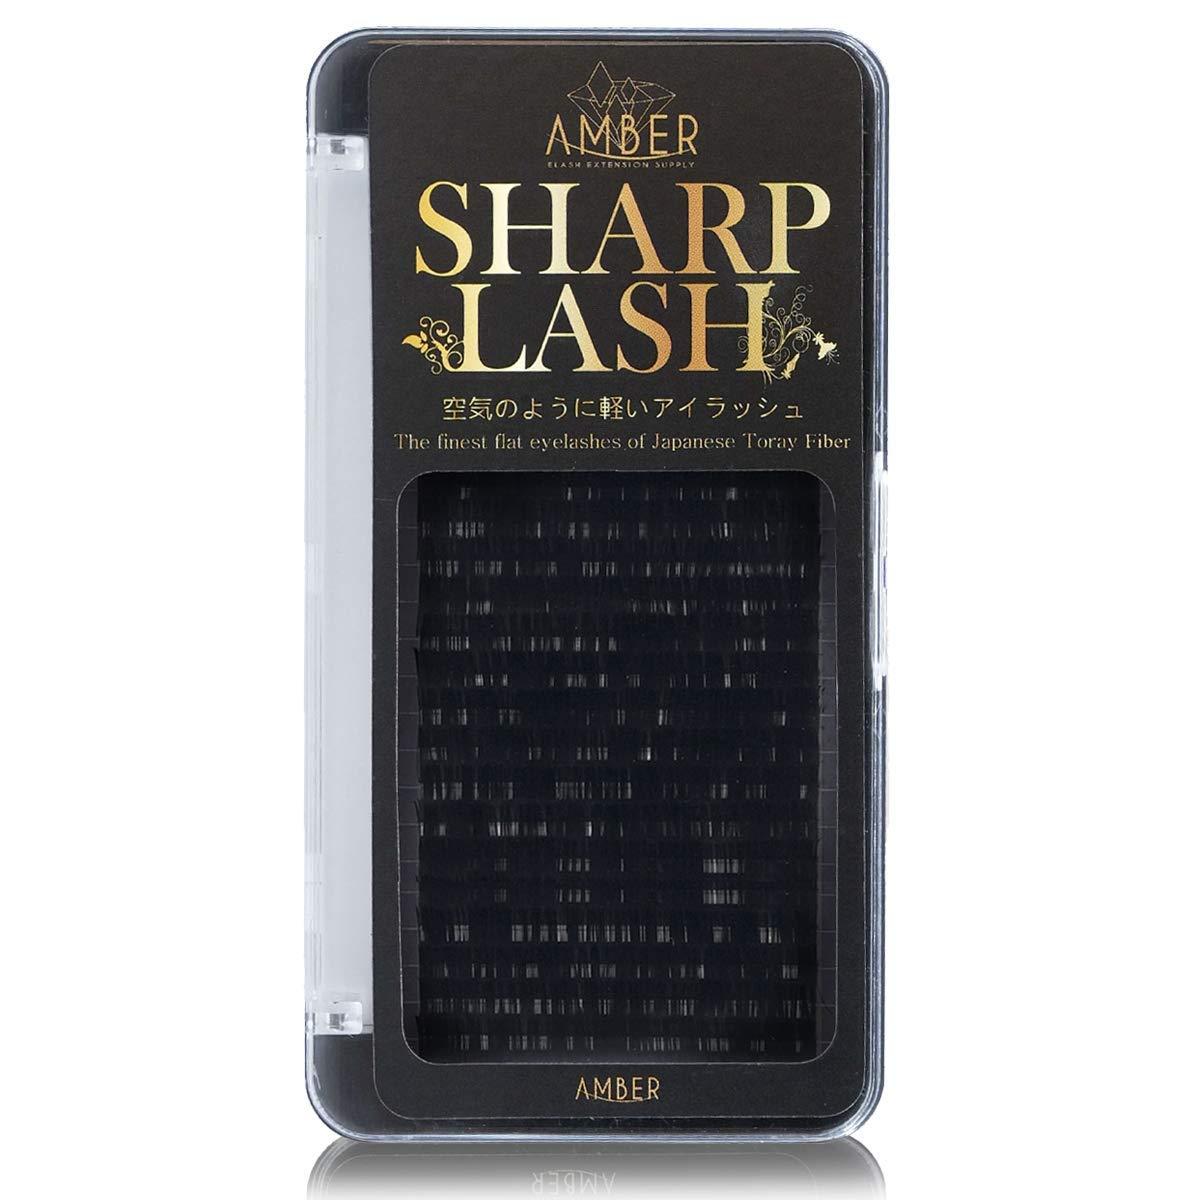 Sharp Lash - Matt Flat lash Eyelash Extension 0.25mm Thickness (10mm, C Curl)